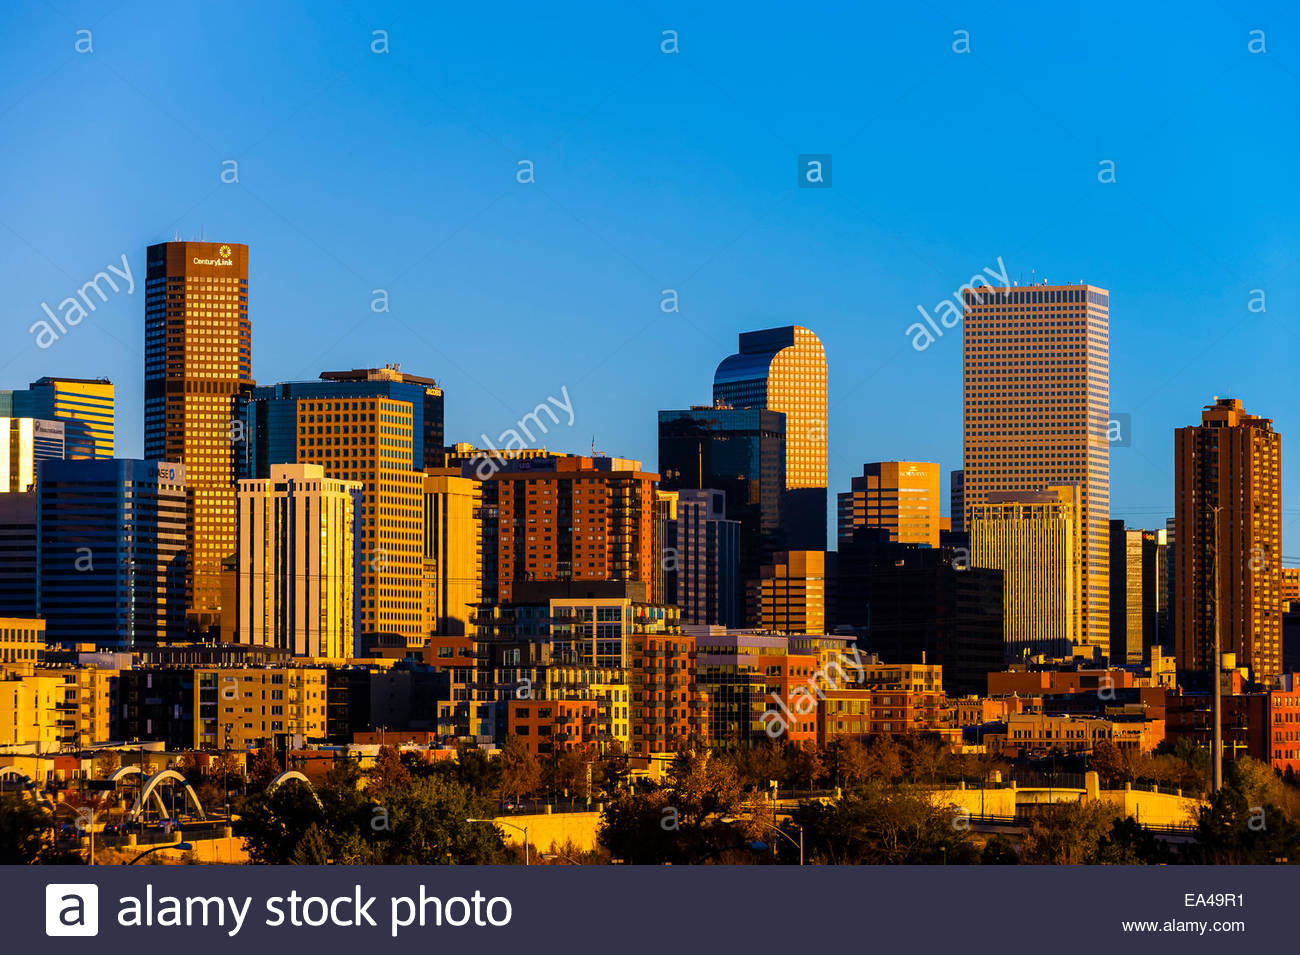 Downtown Denver, Colorado USA. - Stock Image